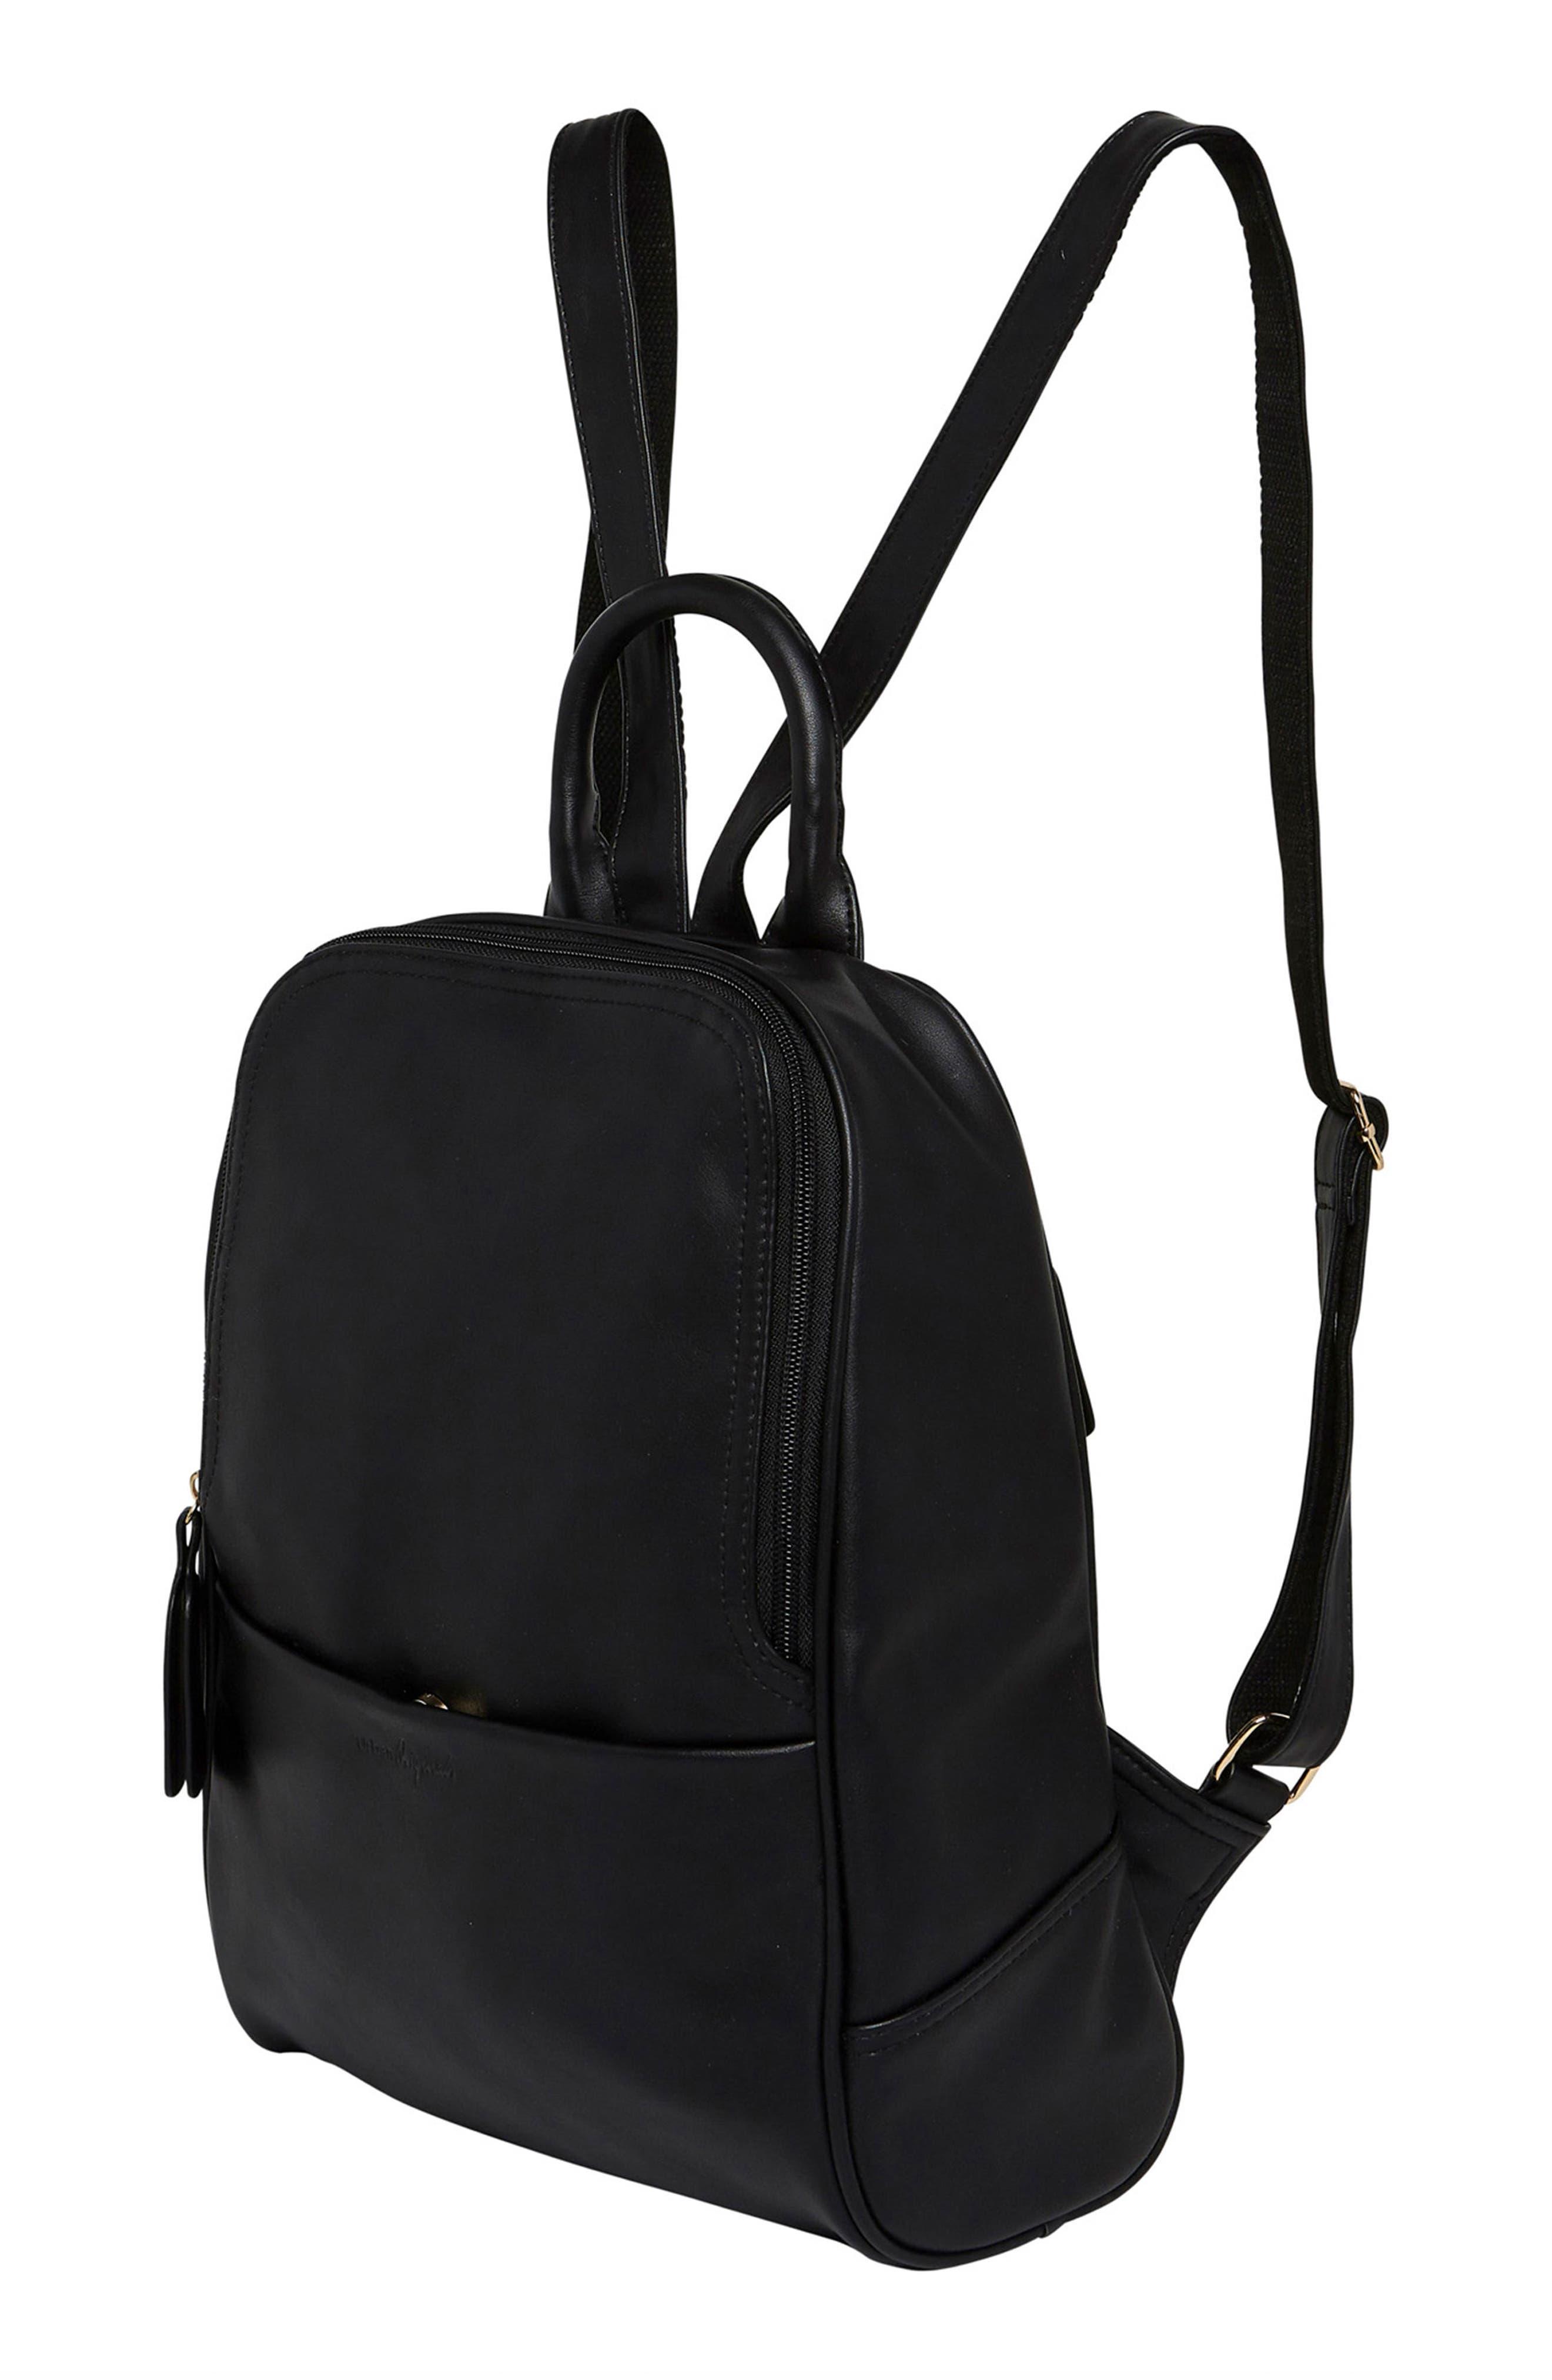 Evolution Vegan Leather Backpack,                             Alternate thumbnail 4, color,                             BLACK